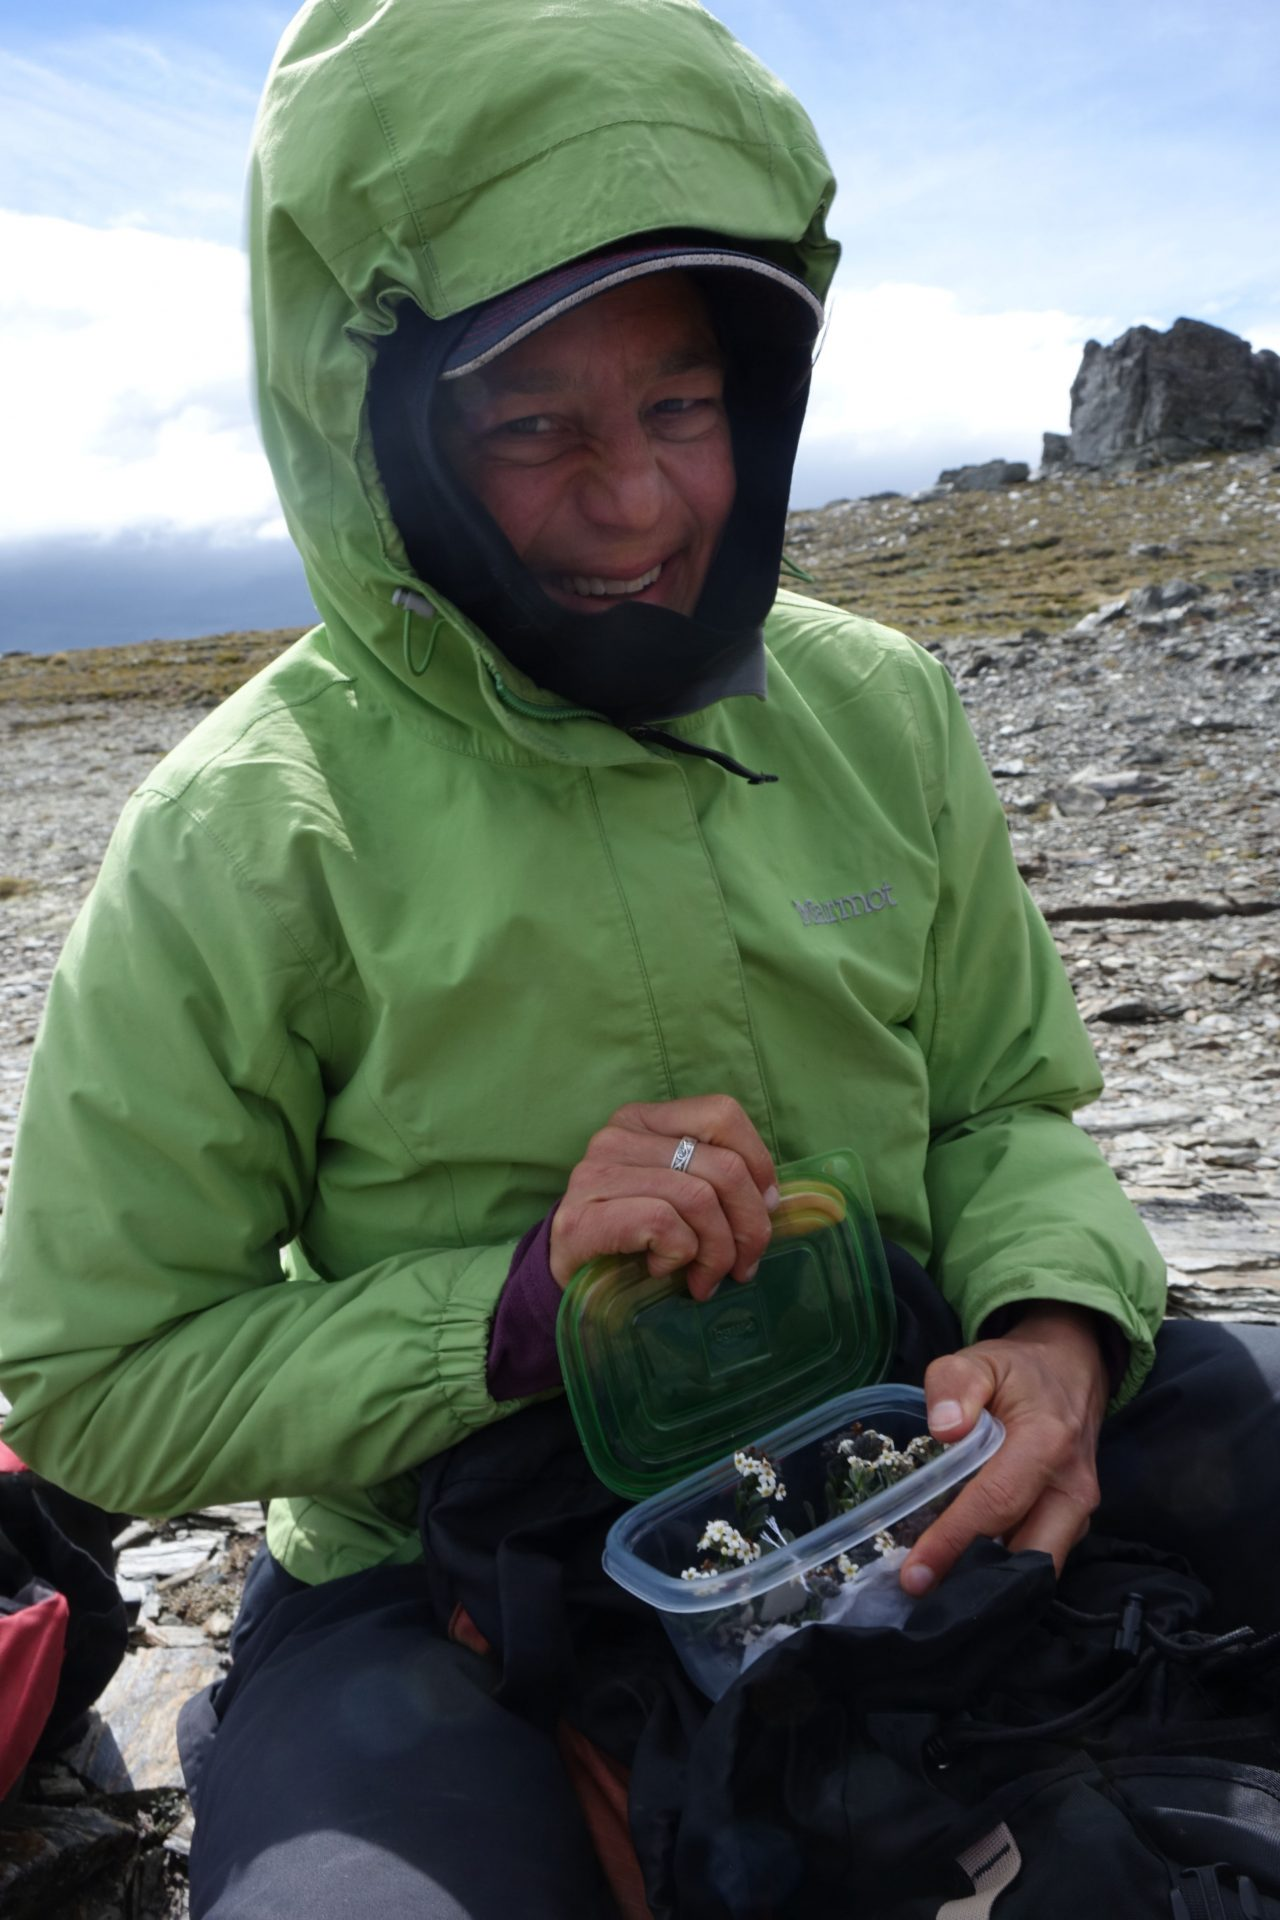 Heidi Meudt collecting a specimen of Myosotis oreophila SP111278, Dunstan Mountains, Jan 2021. Photo by John Barkla.